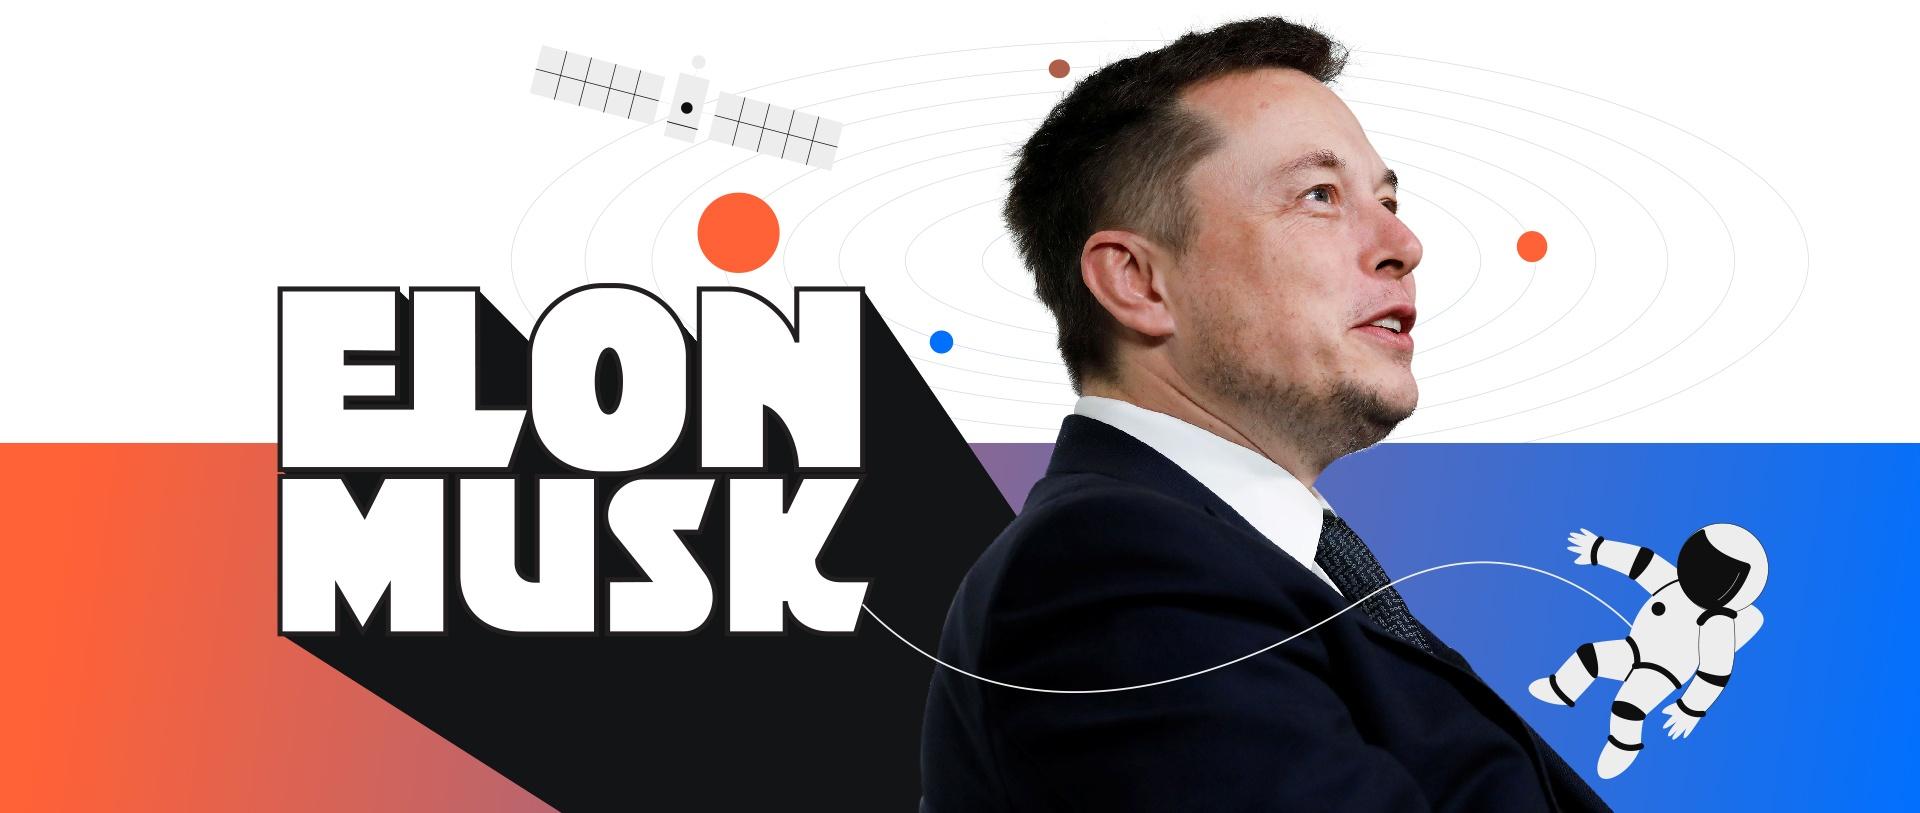 Elon Musk - nguoi kien tao tuong lai, thien tai co doc hinh anh 12